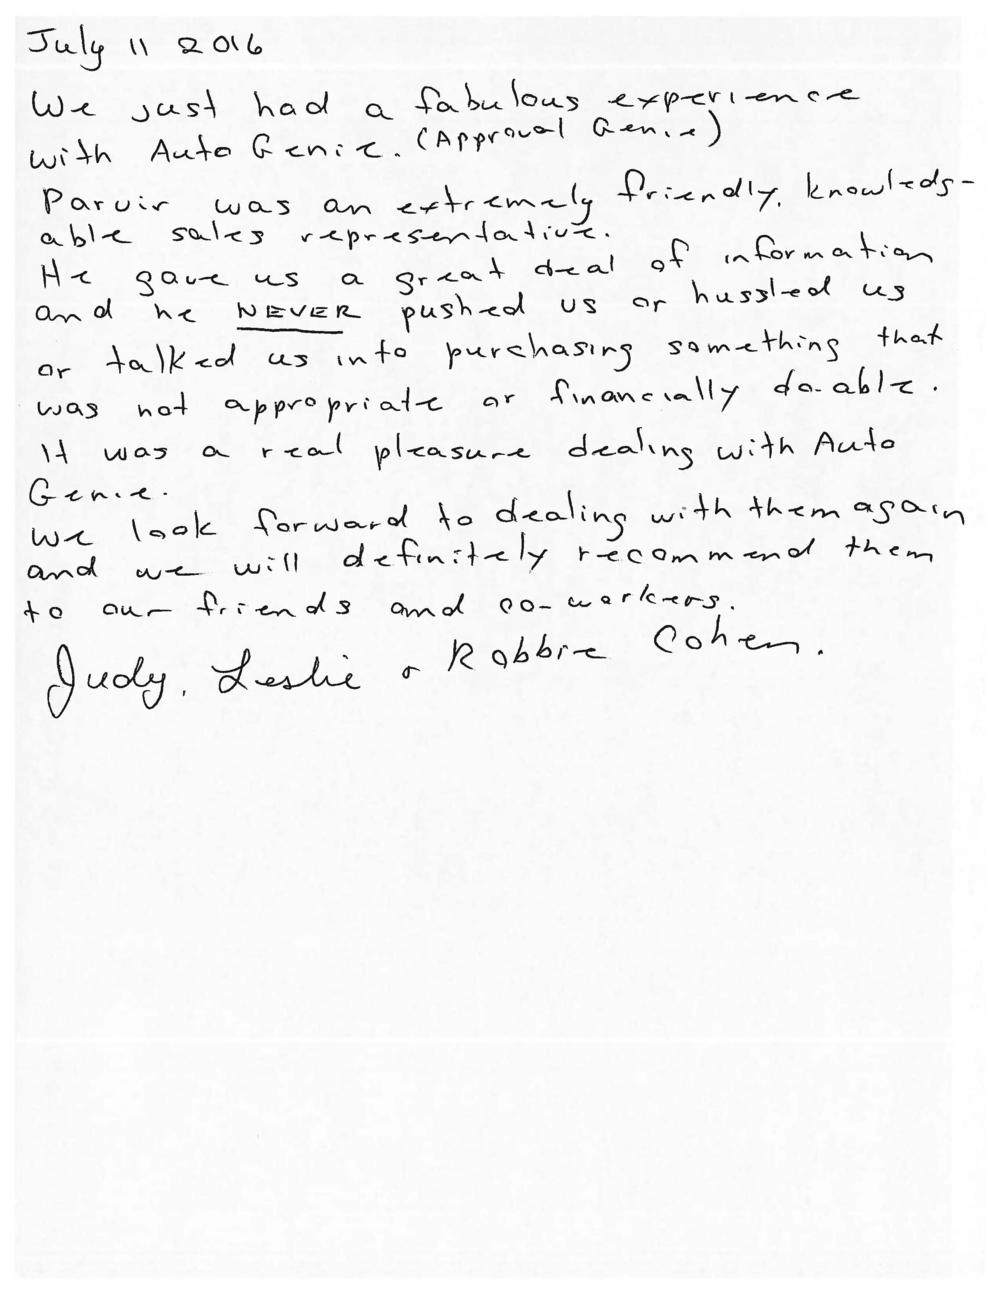 Judy Cohen_Testimonial.jpg